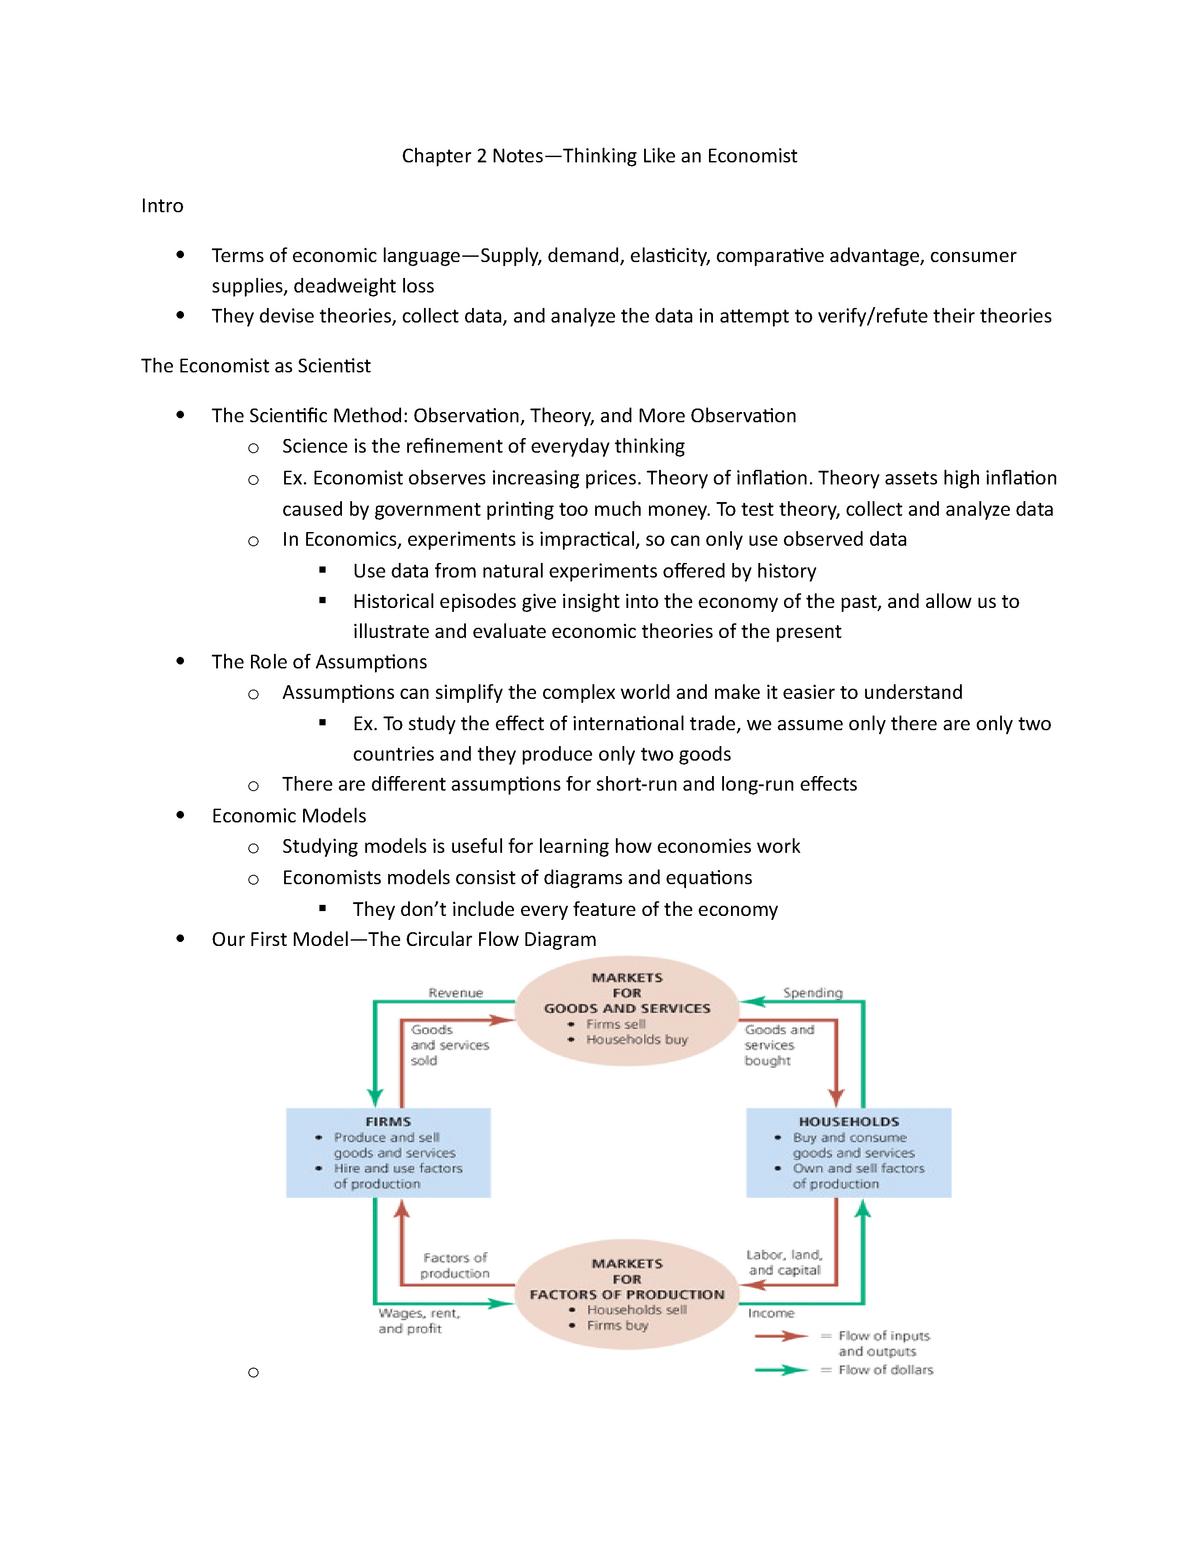 Econ Chapter 2 Notes - Summary Principles of Economics - StuDocu